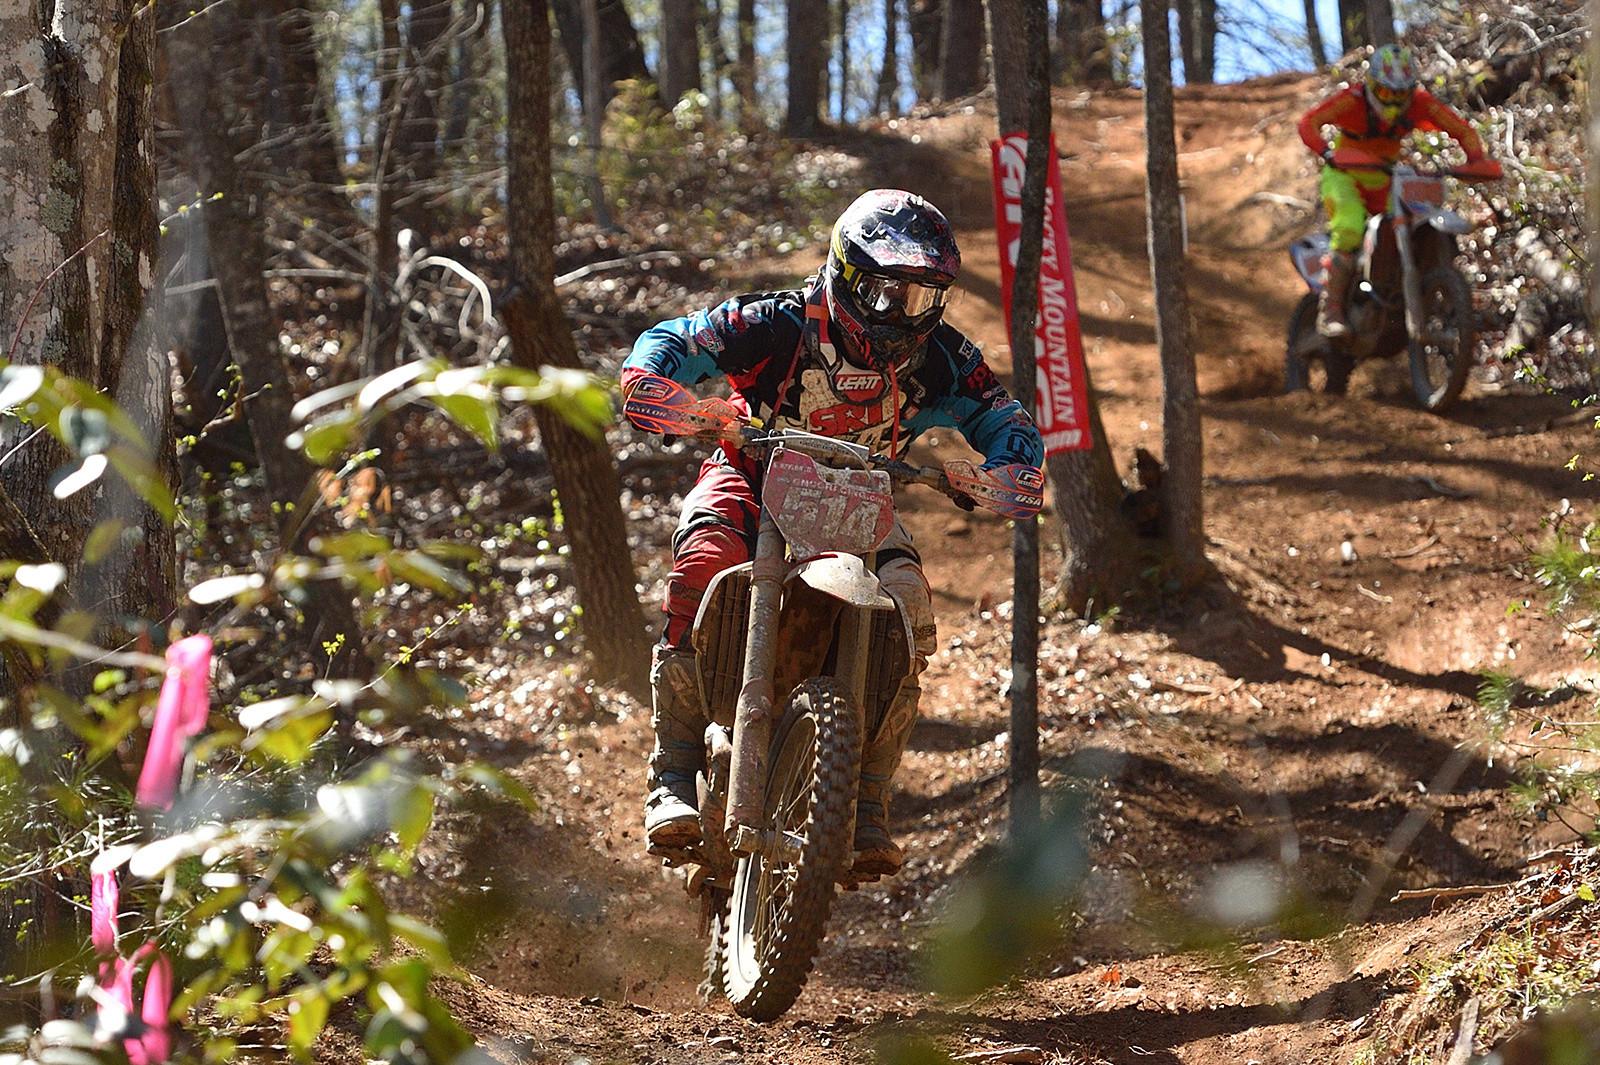 Steward Baylor - Steele Creek GNCC - Motocross Pictures - Vital MX